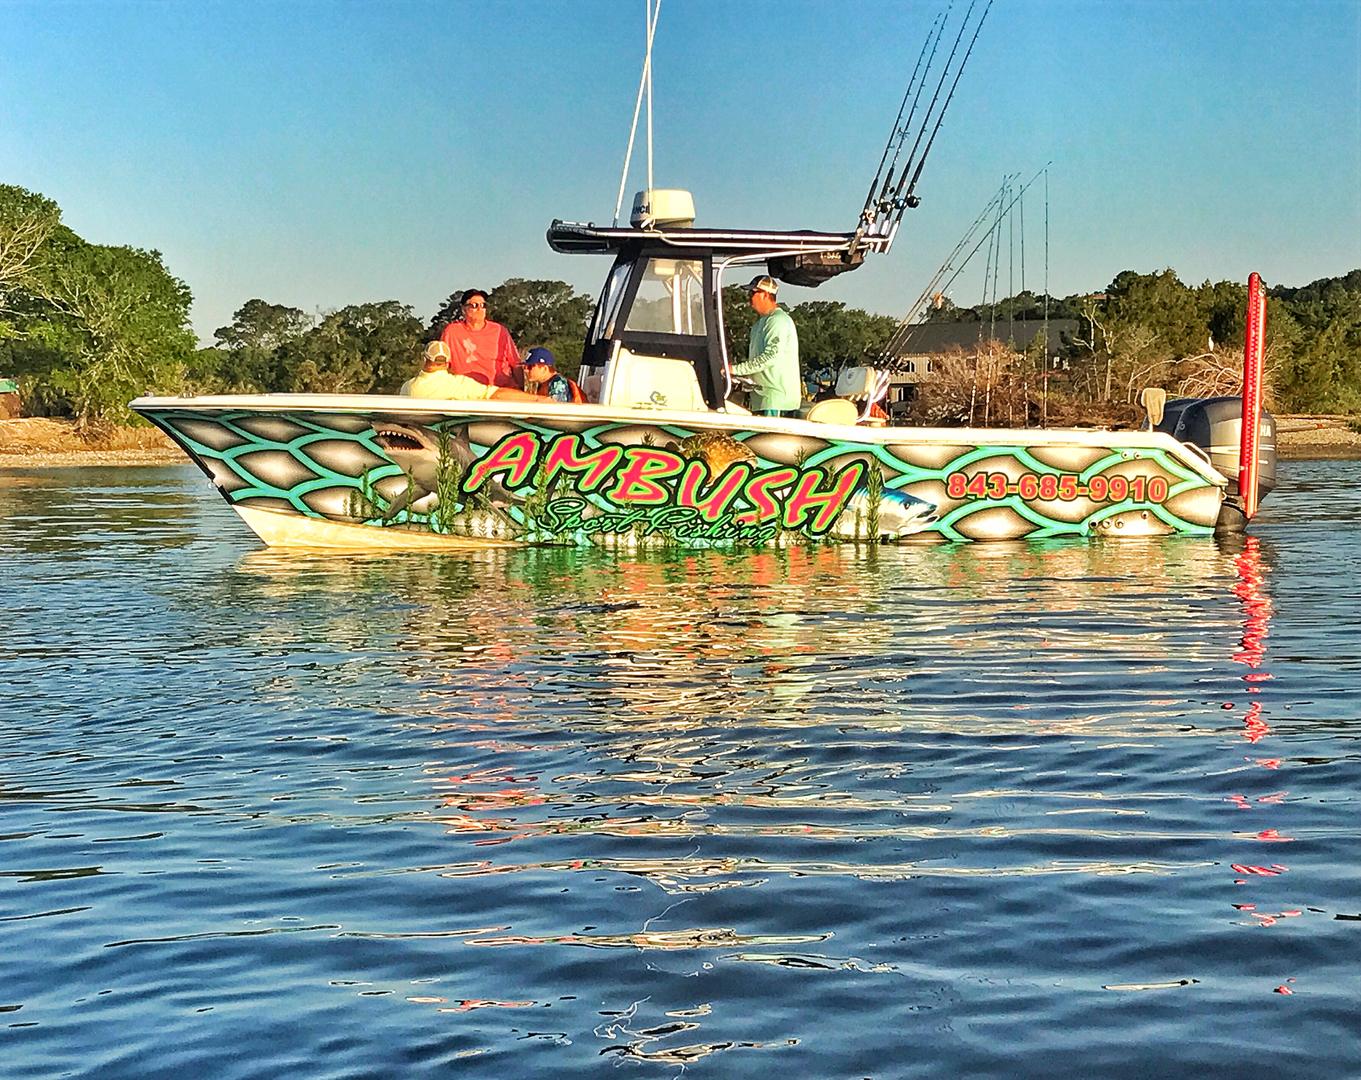 Murrells Inlet Fishing Charters - Murrells Inlet Fishing Charters LLC